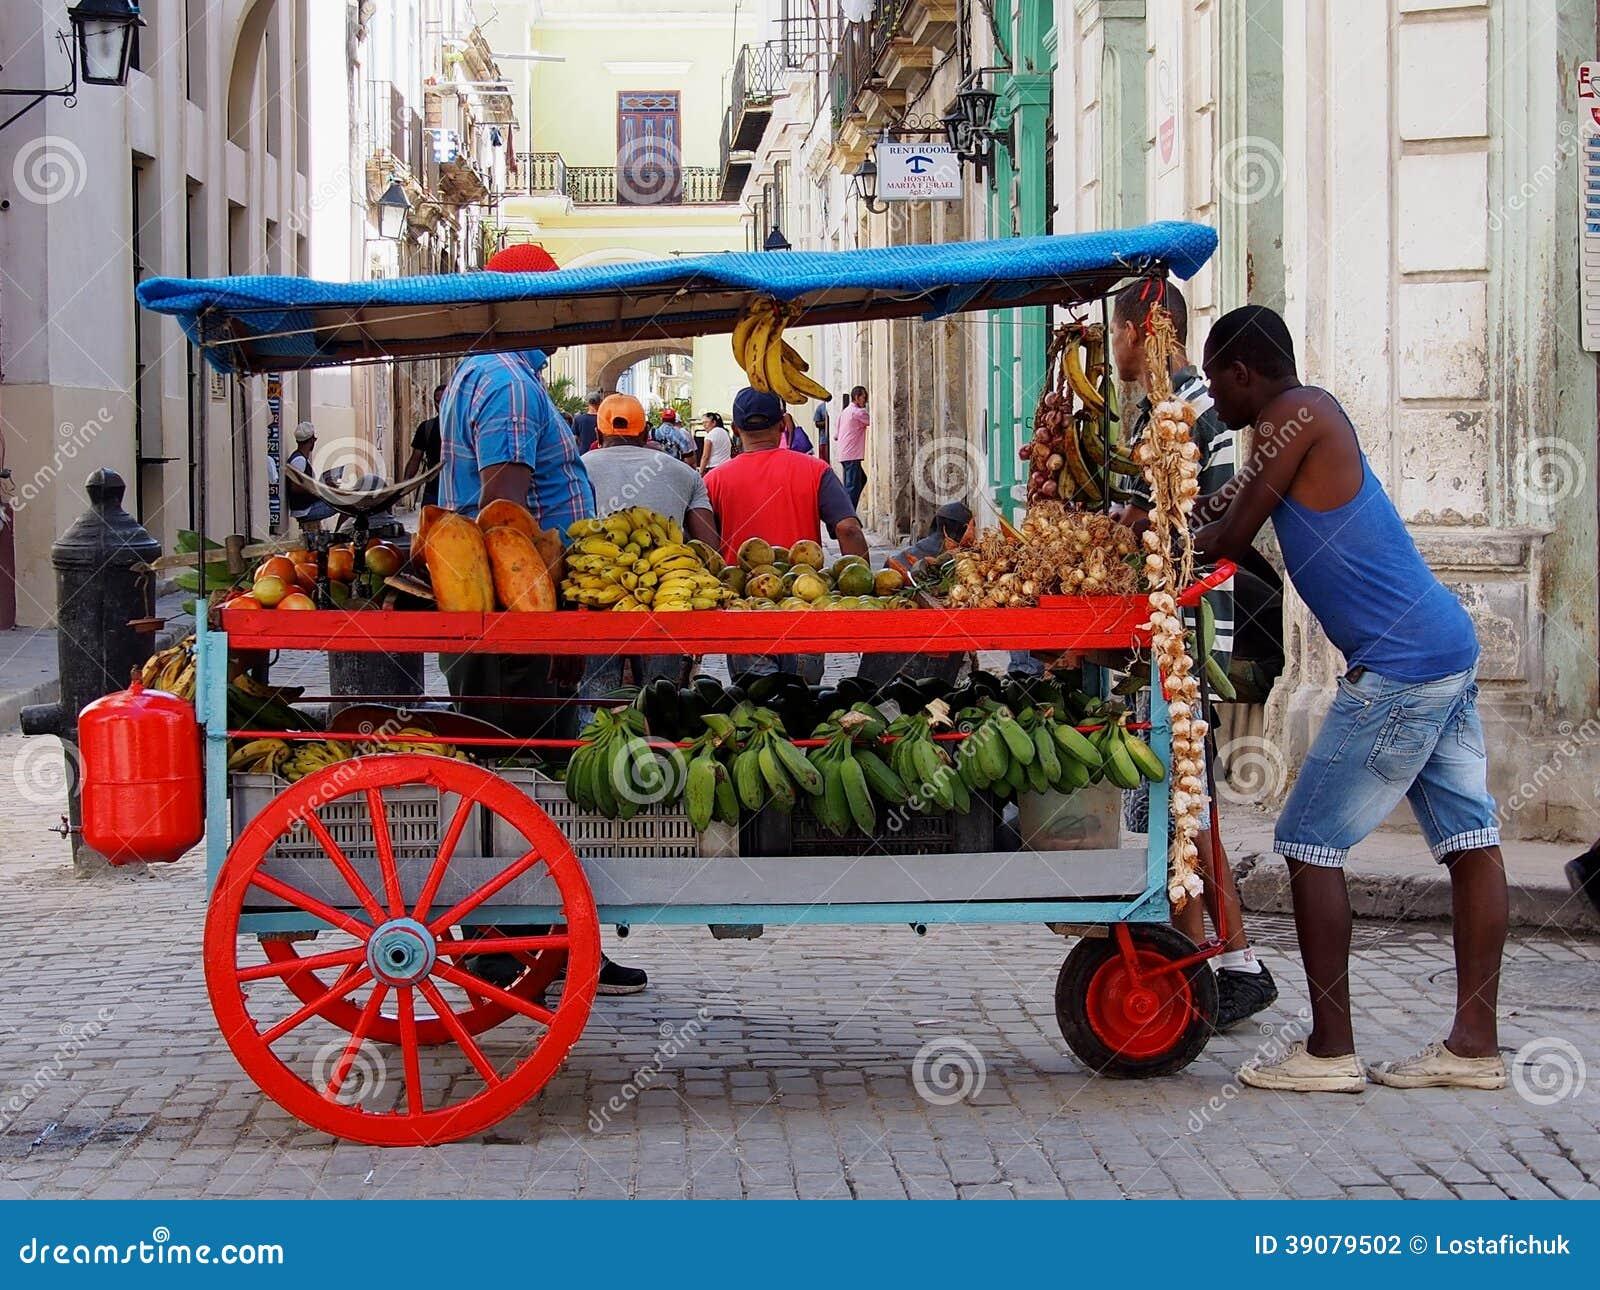 Caras do vendedor do carro do fruto de Cuba